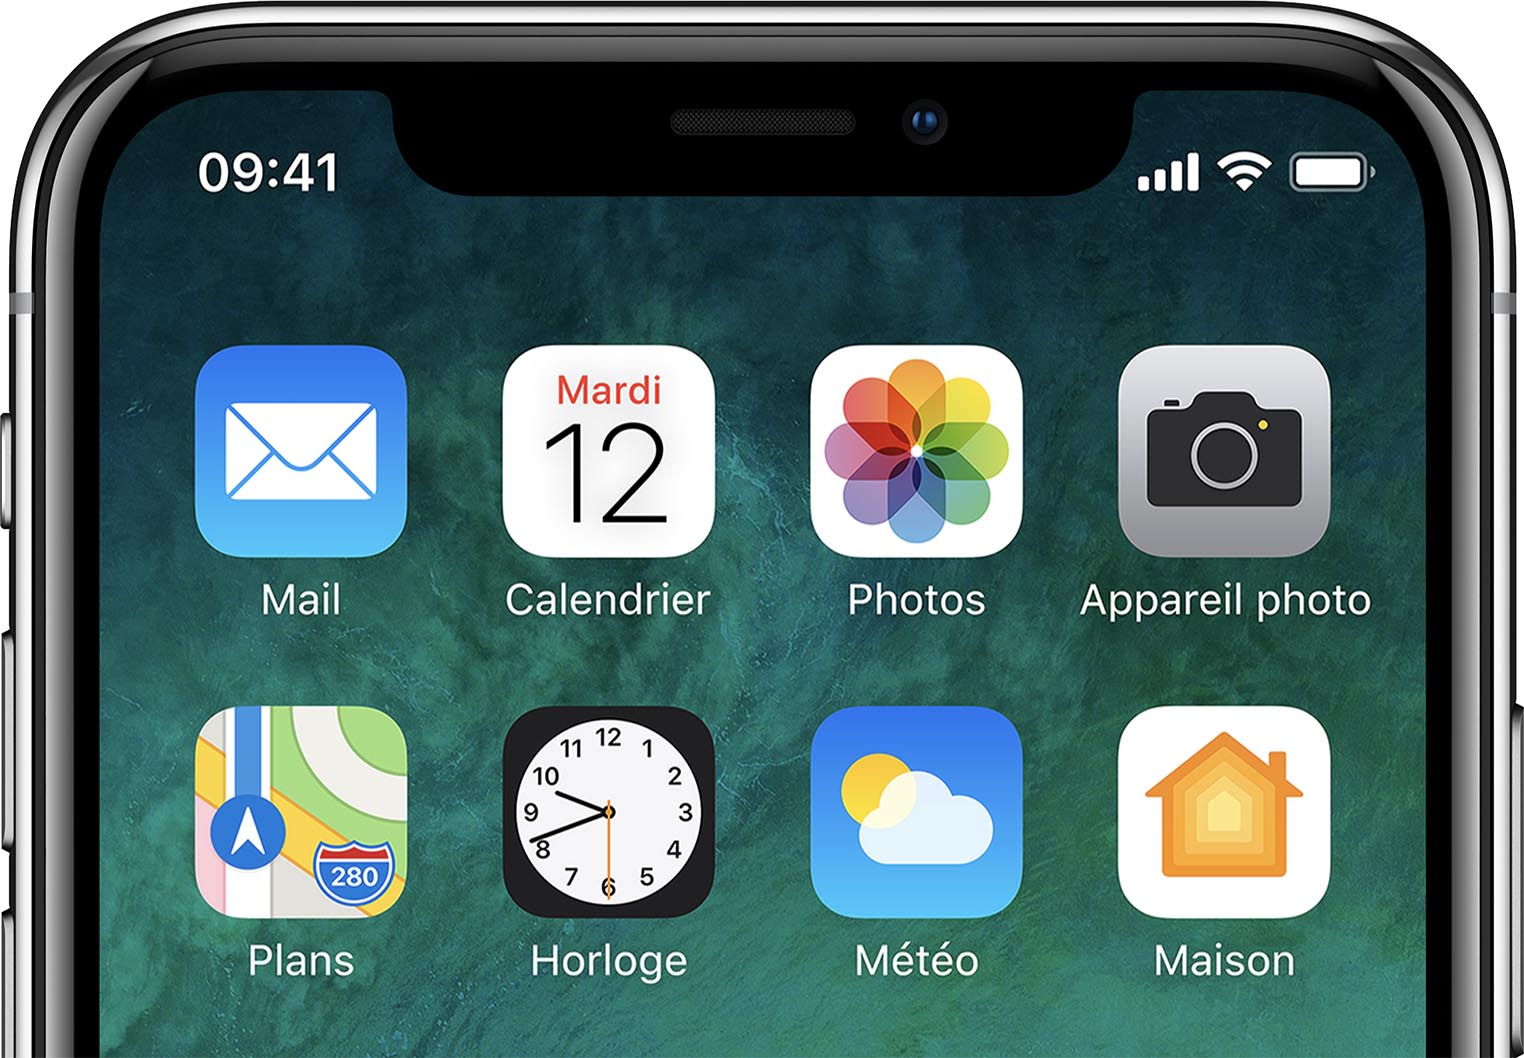 iPhone X interface